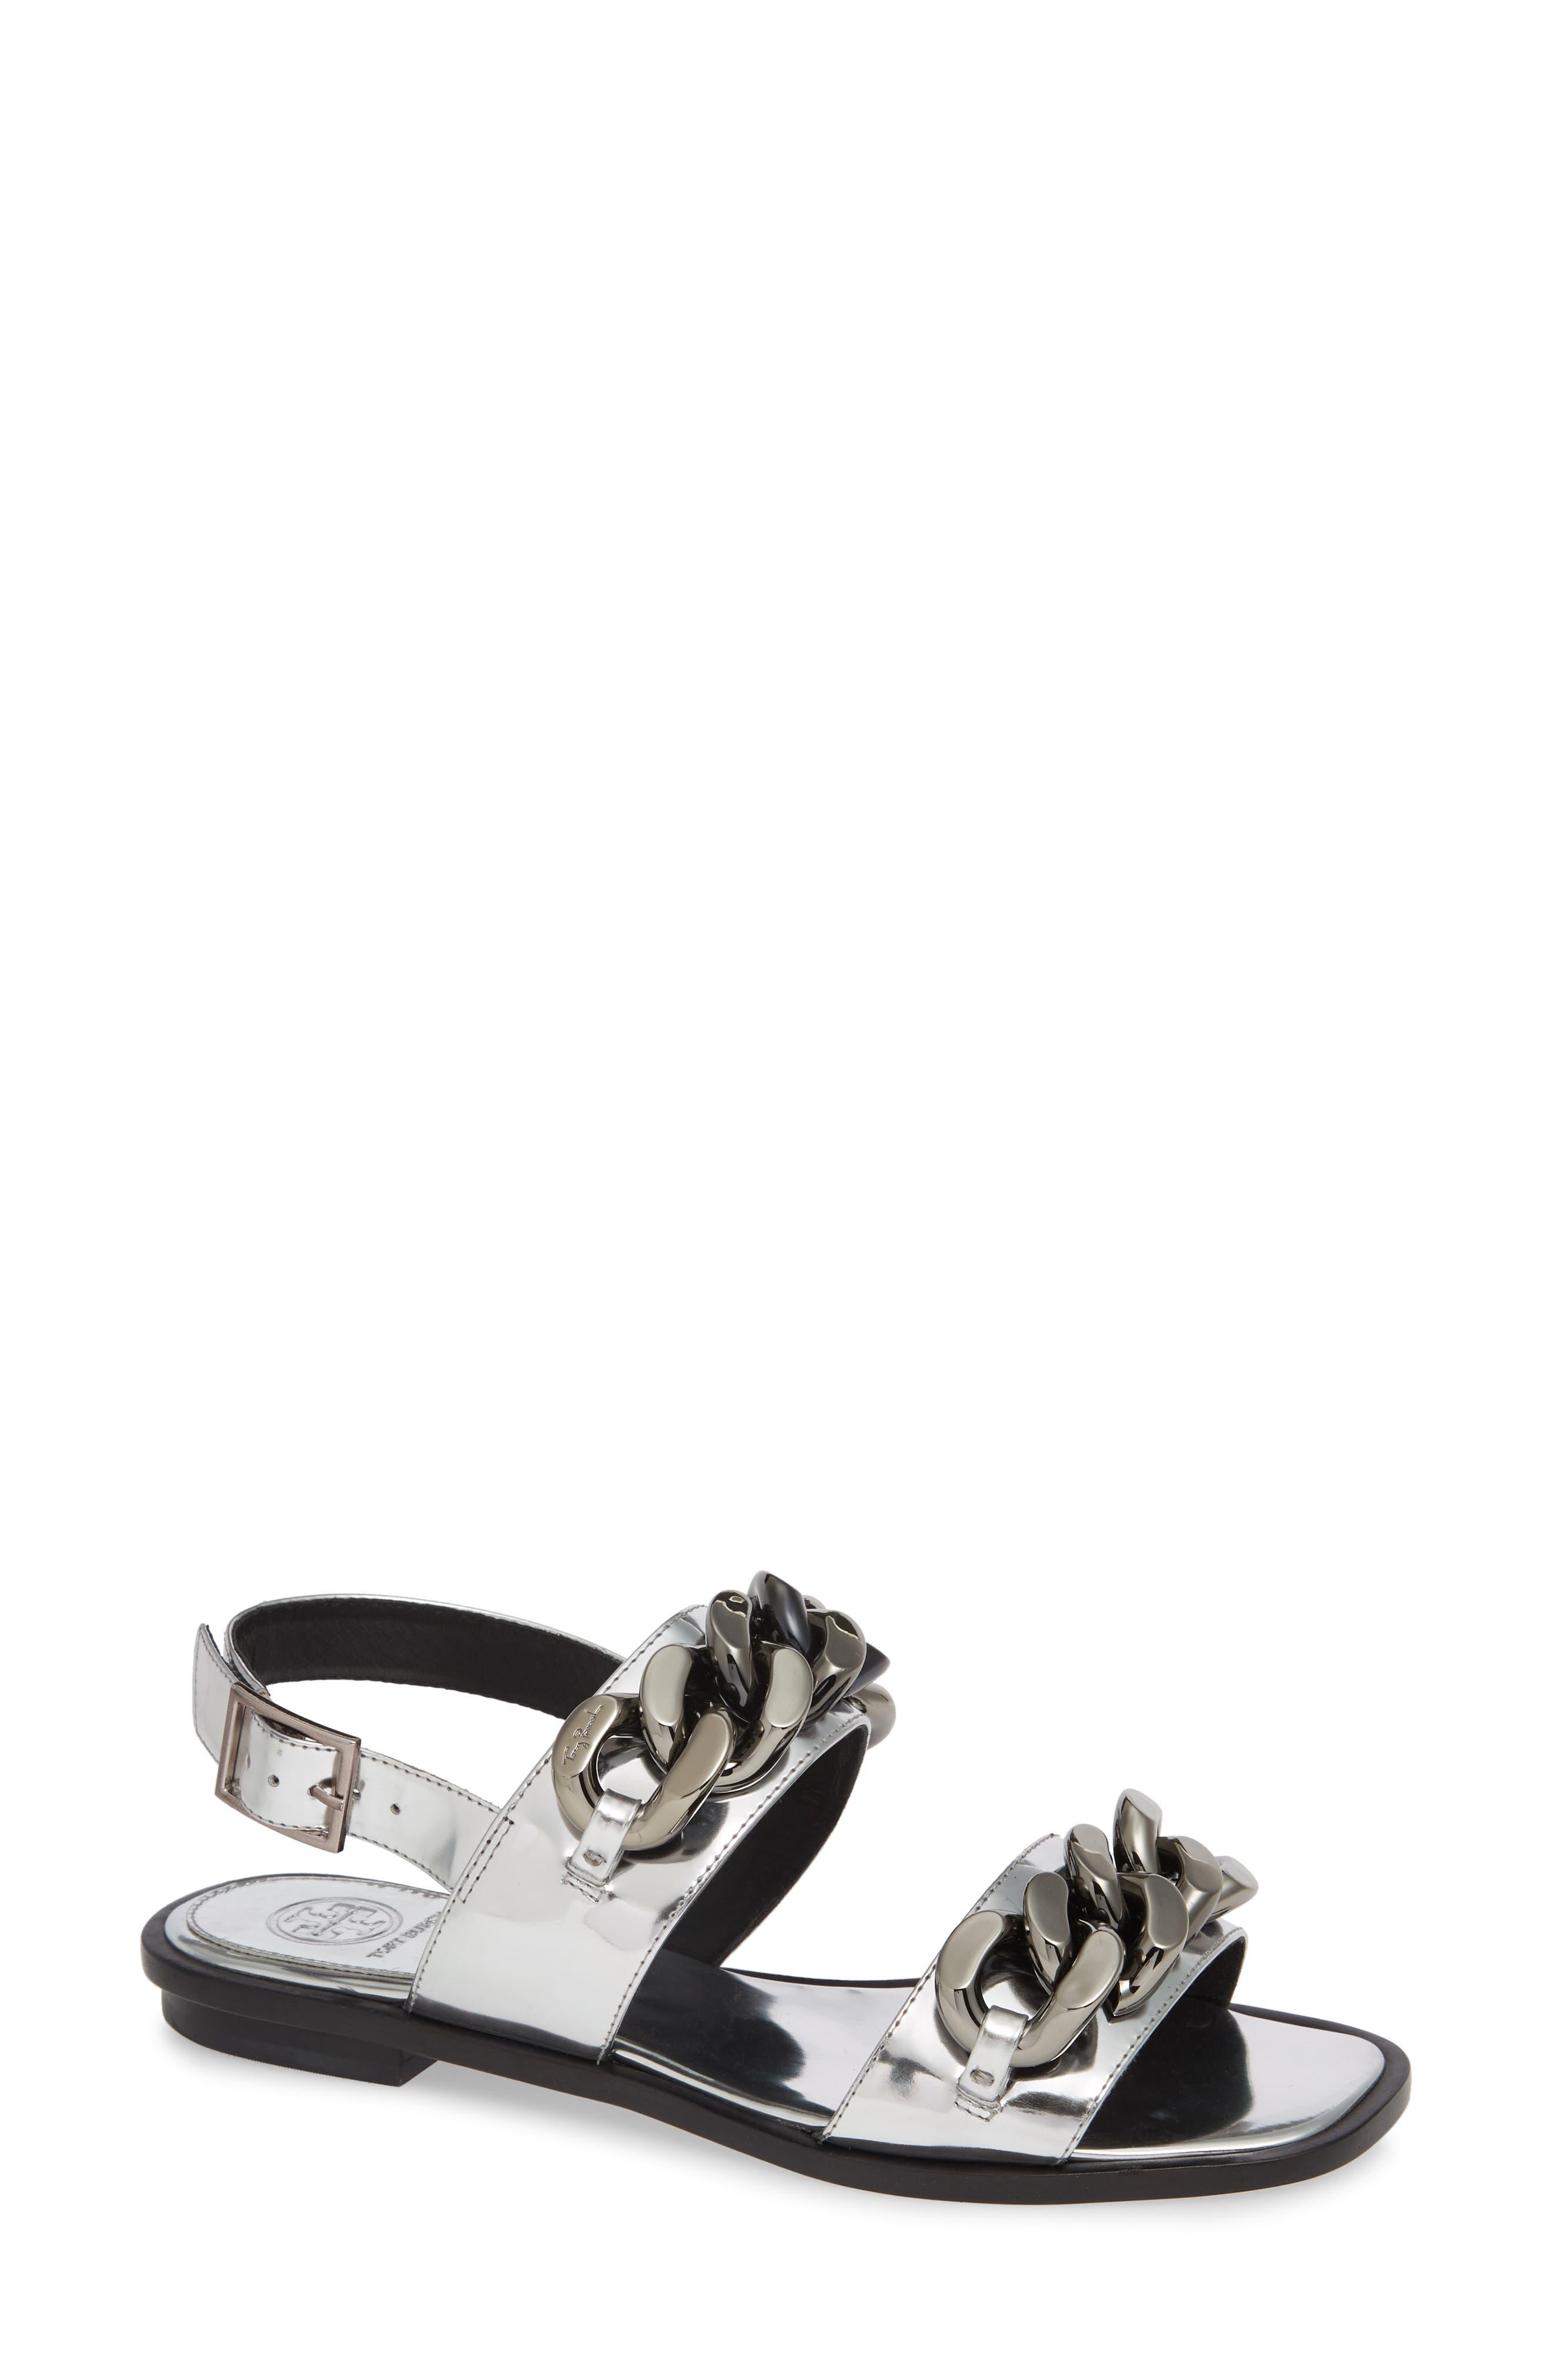 Tory Burch Adrien Chain Sandal, Metallic